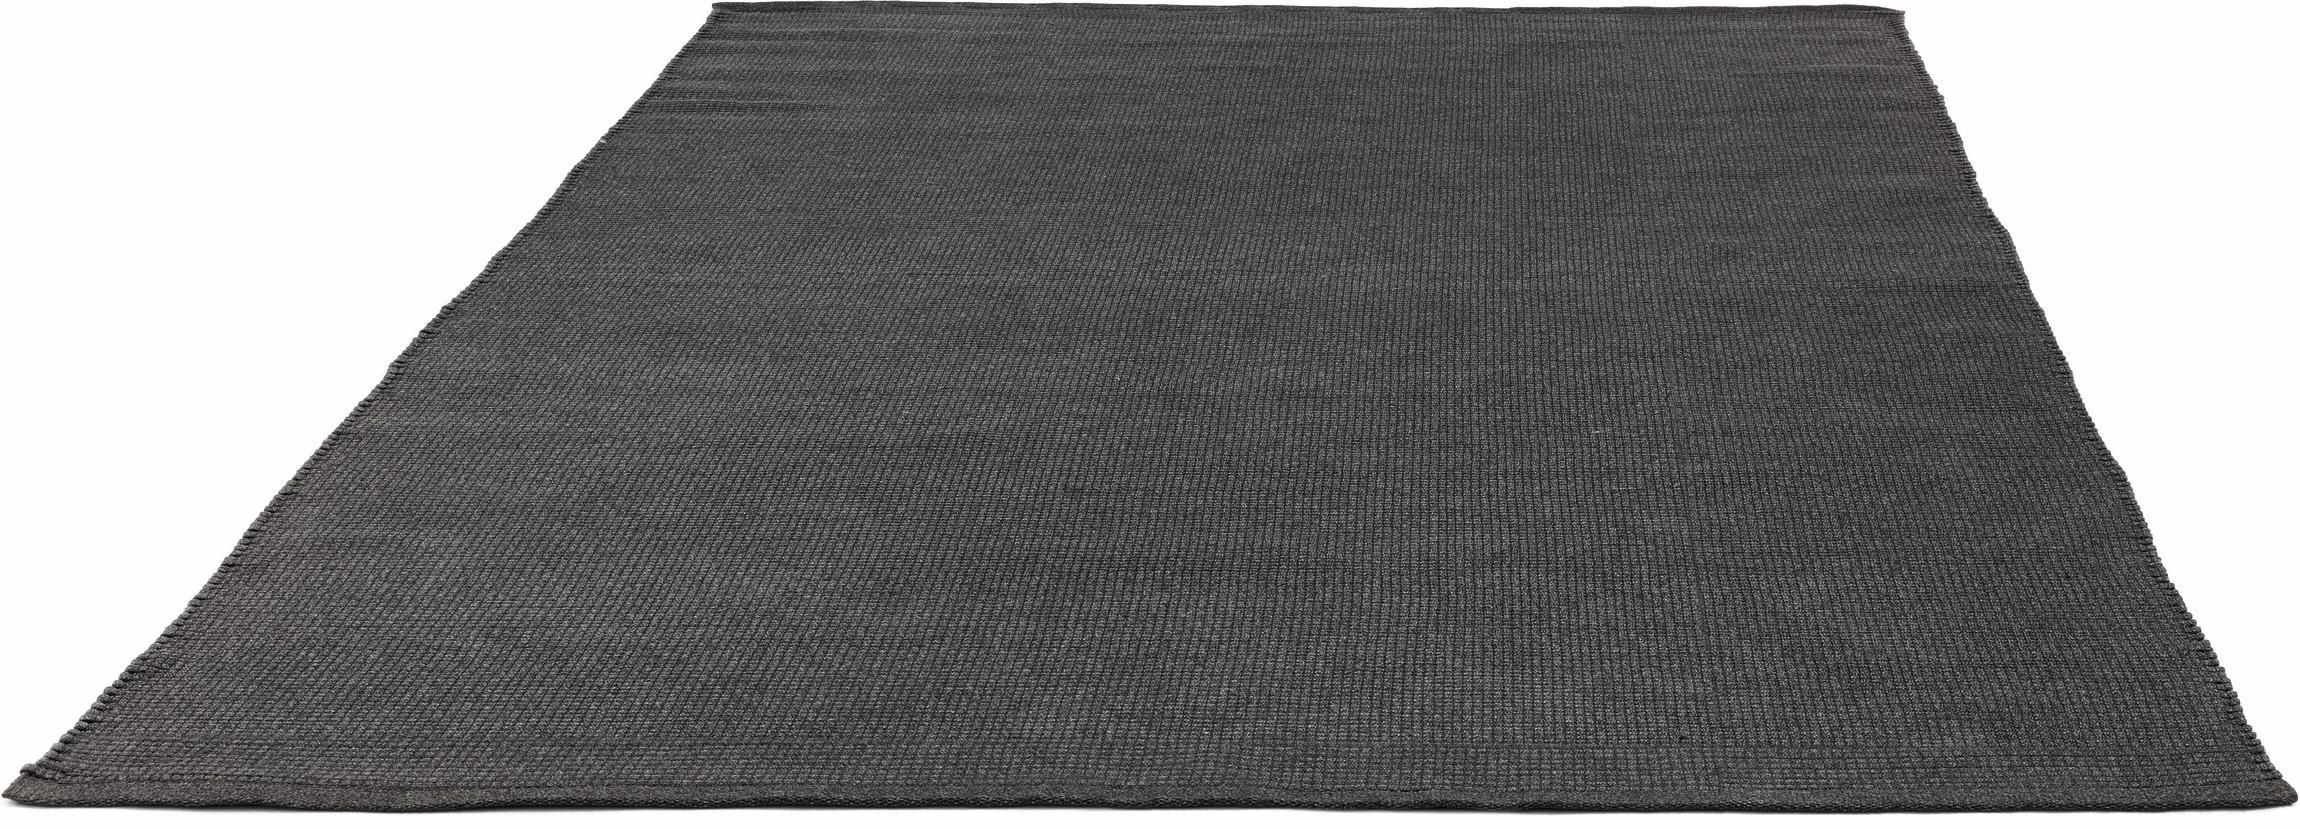 Alfombras Linear 200x290 antracita